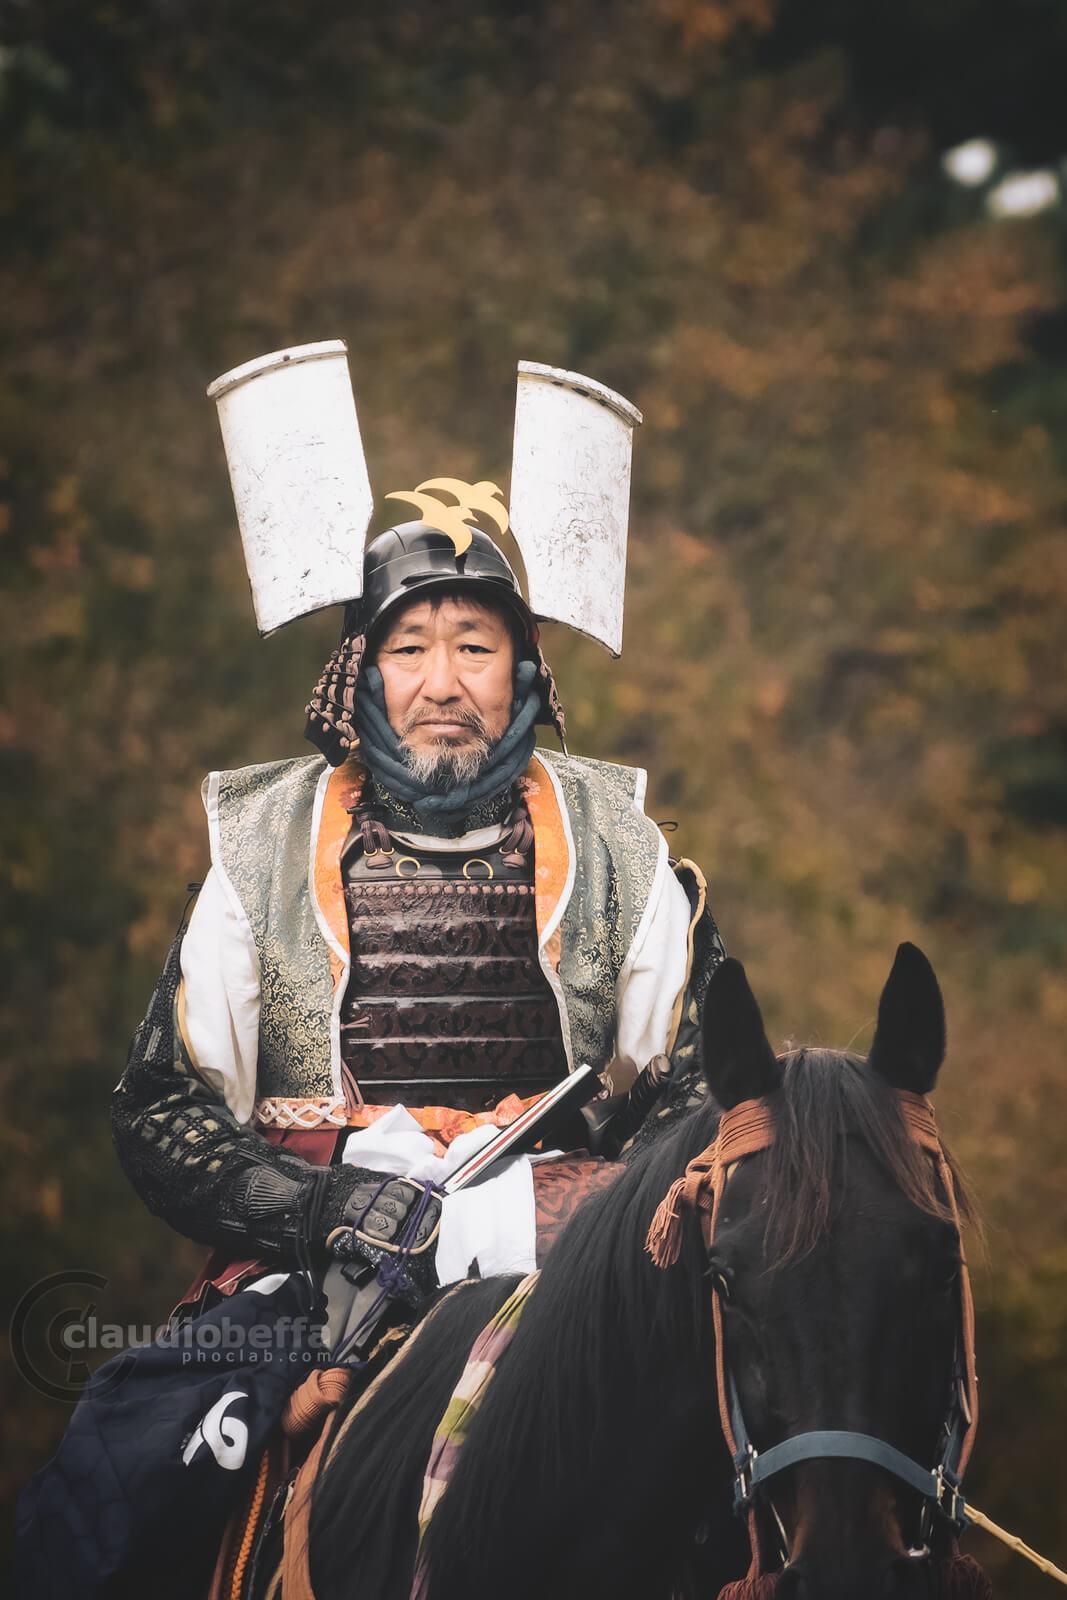 Shibata Katsuie, samurai and commander for Oda Nobunaga. Yoroi, Armor, Kabuto, Helmet, Jidai Matsuri, Festival, Kyoto, Japan, History, Tradition, Travel.